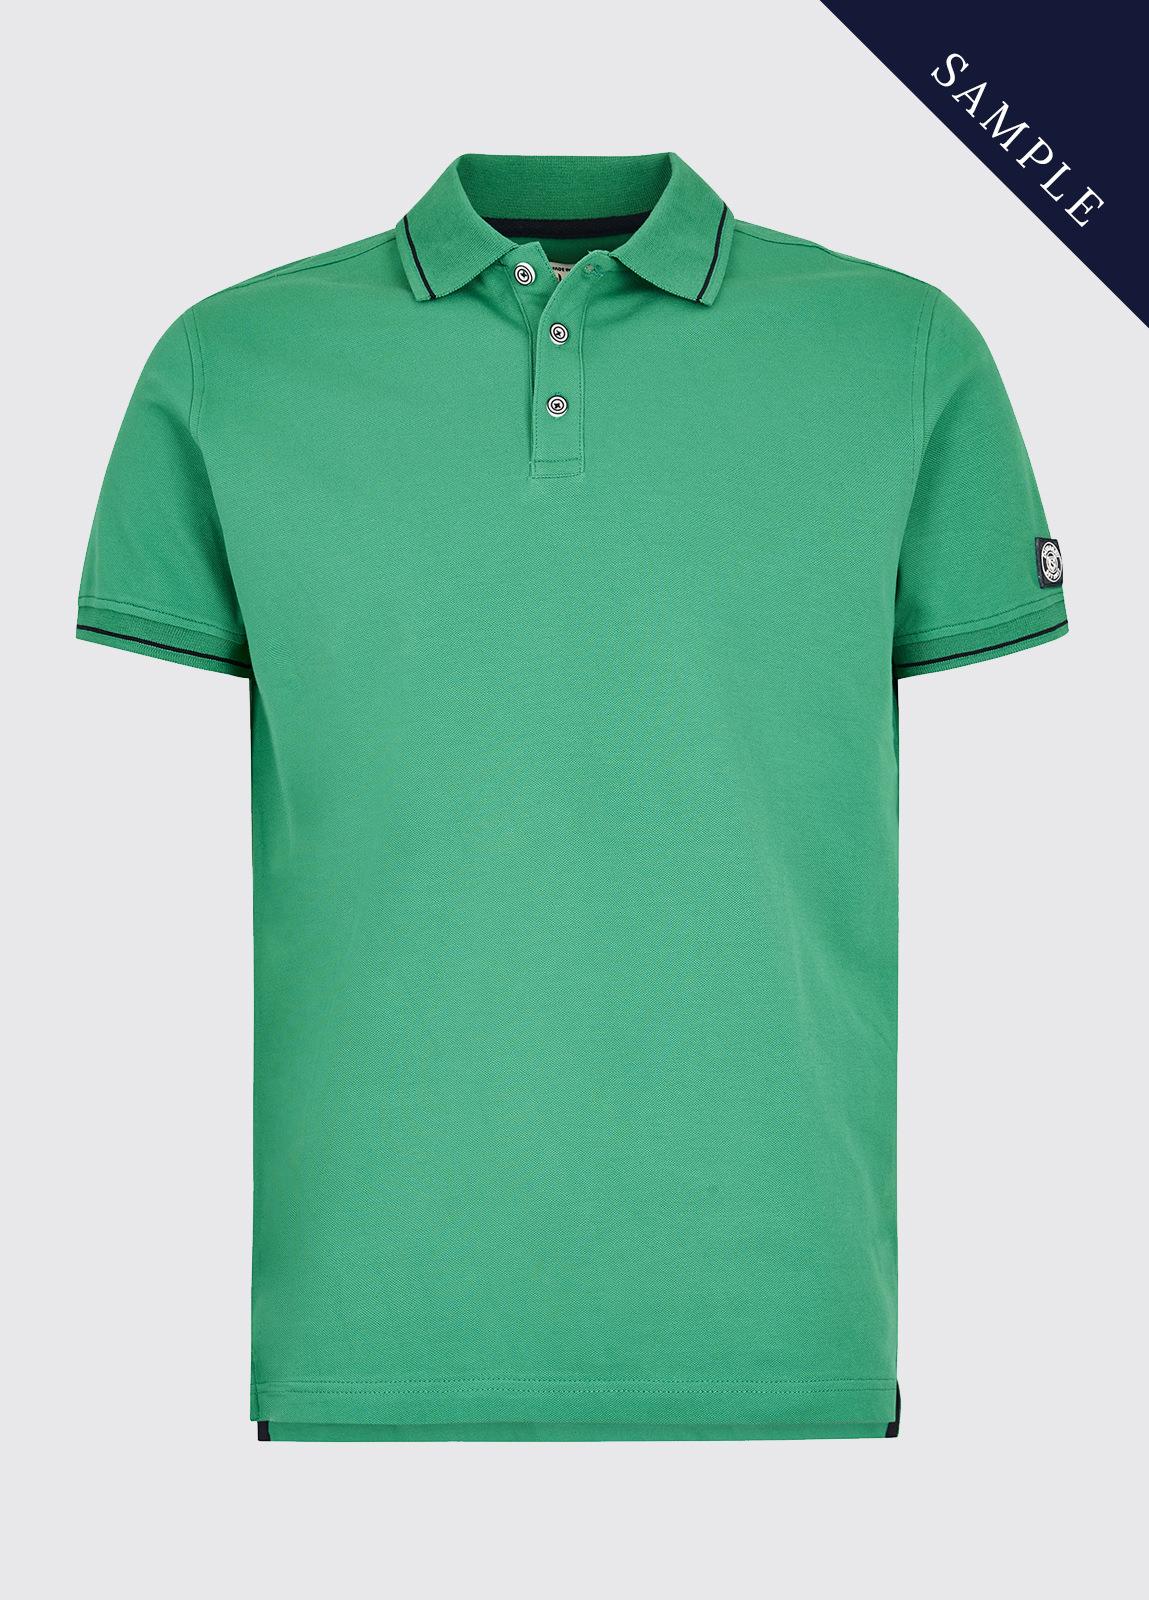 Grangeford Polo Shirt - Kelly Green - Size Medium